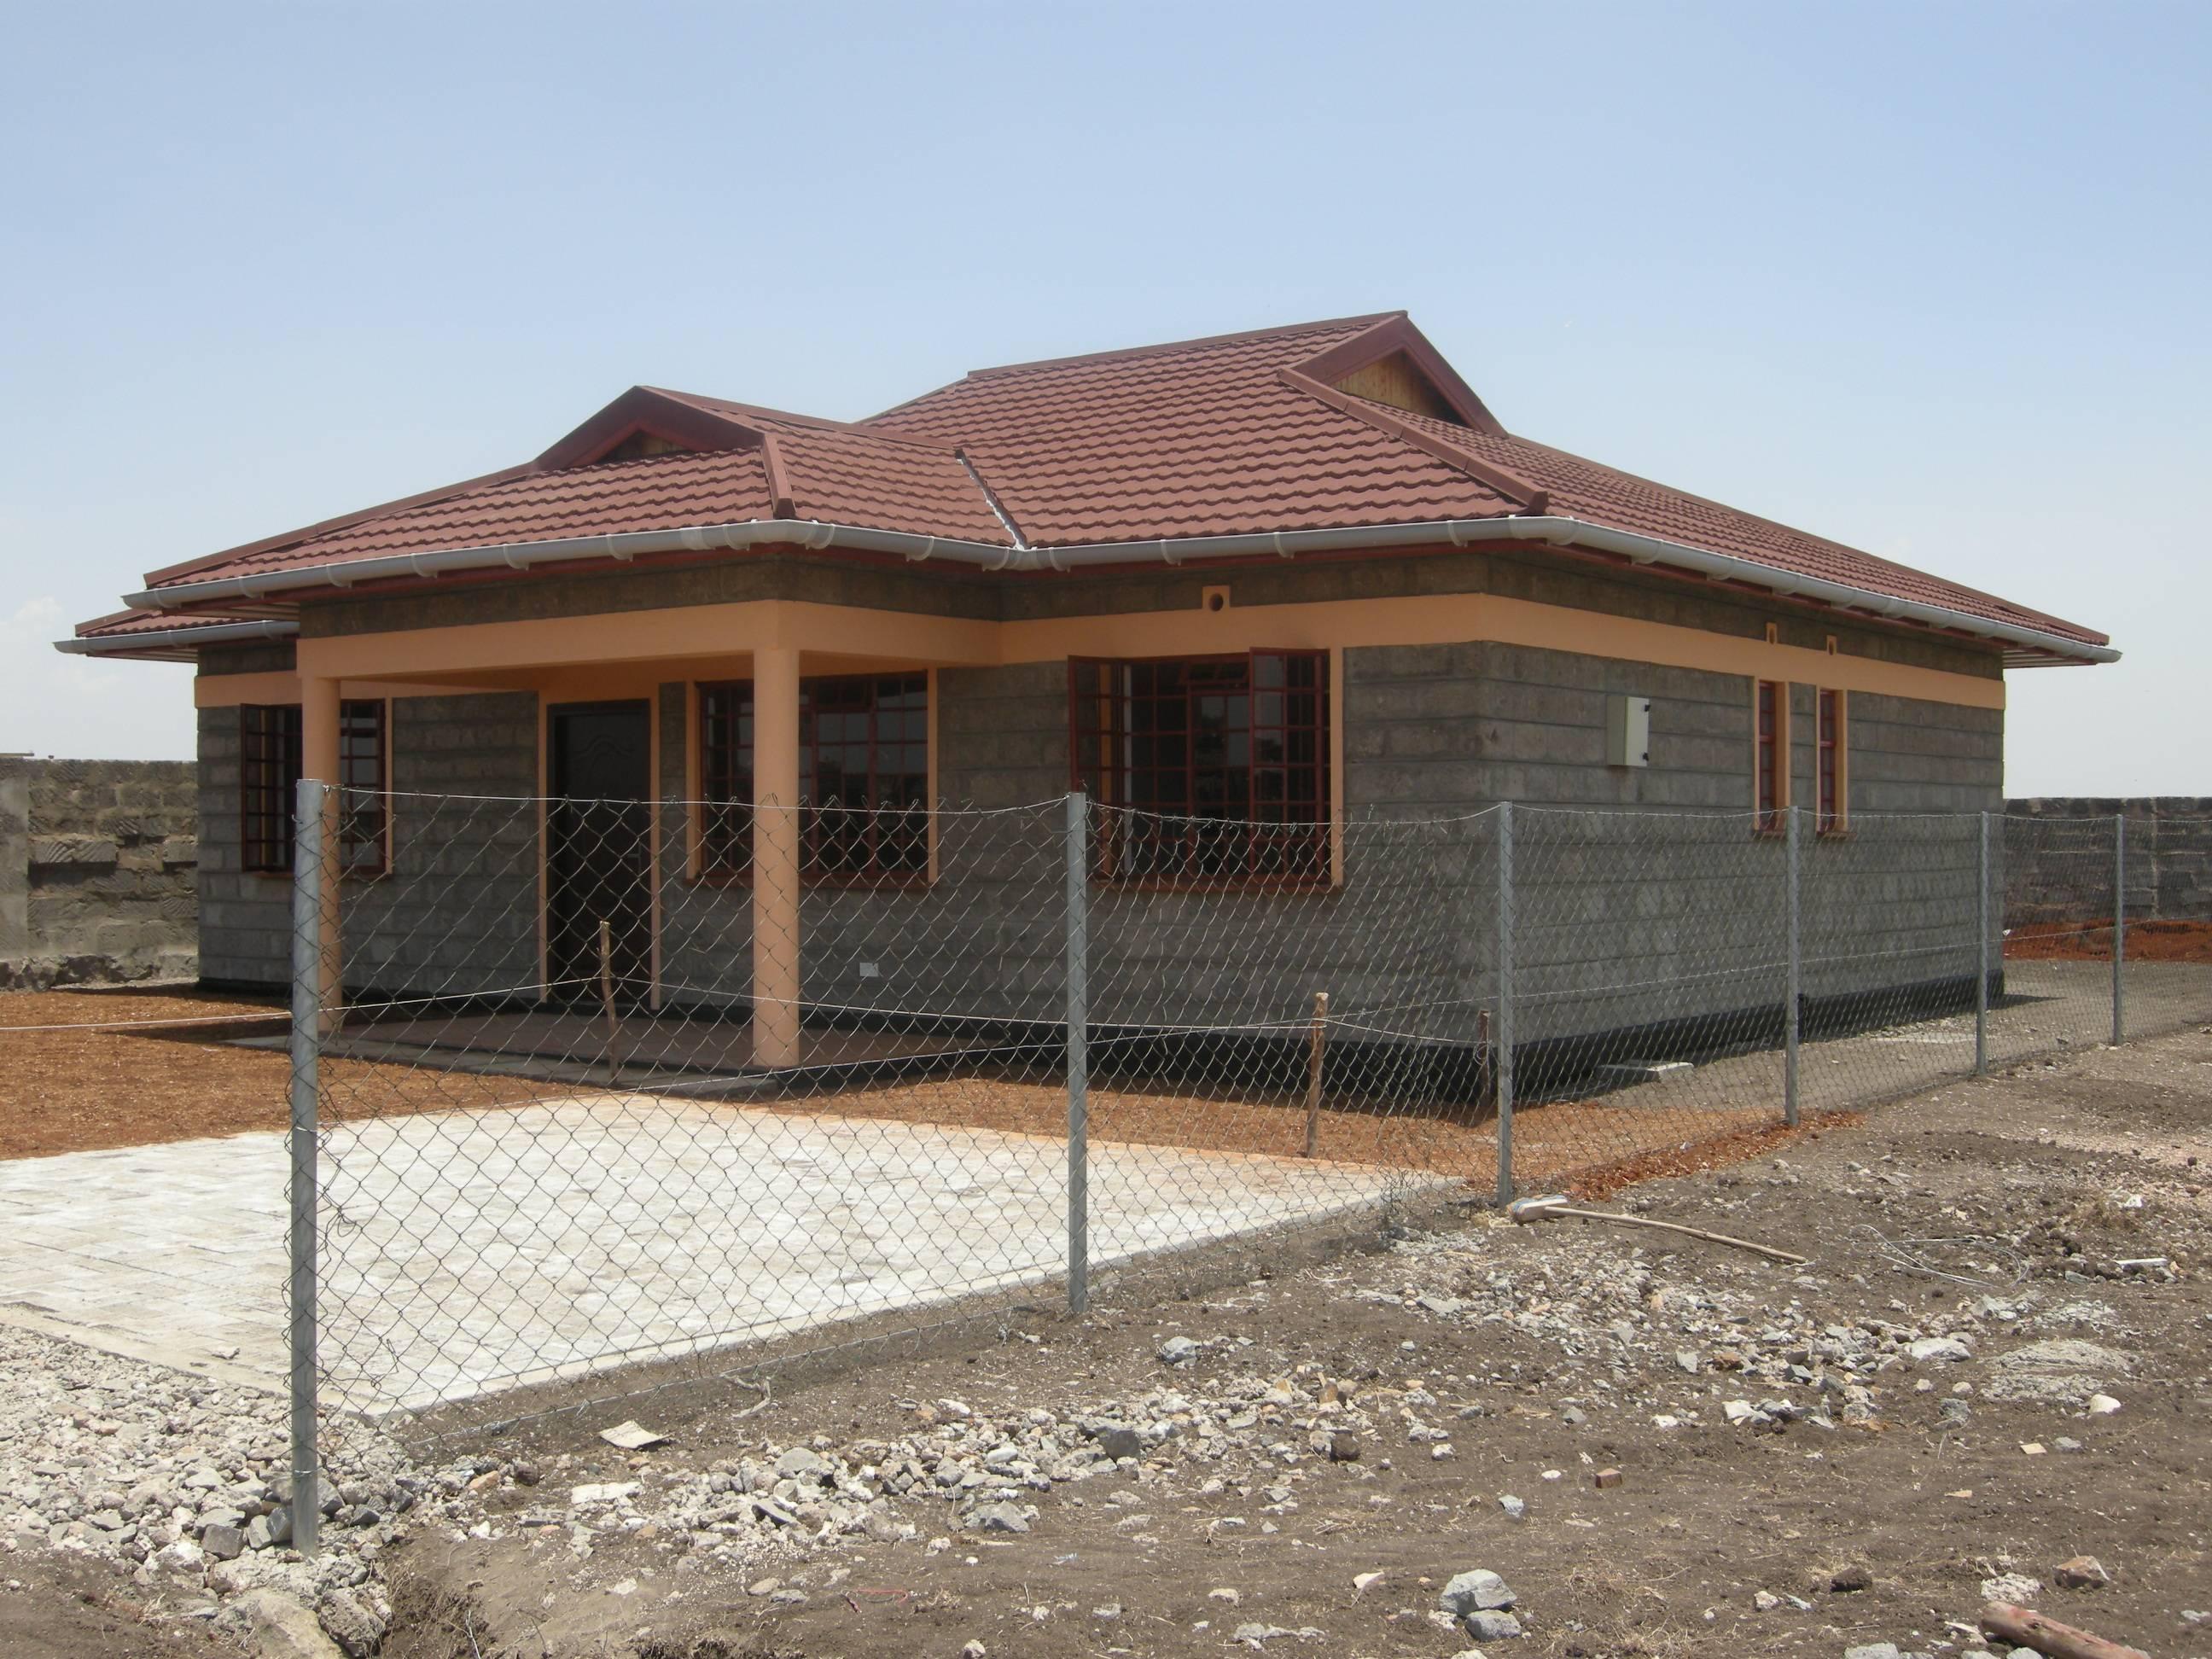 House for sale kitengela nairobi area kenya en silange for Small house designs kenya